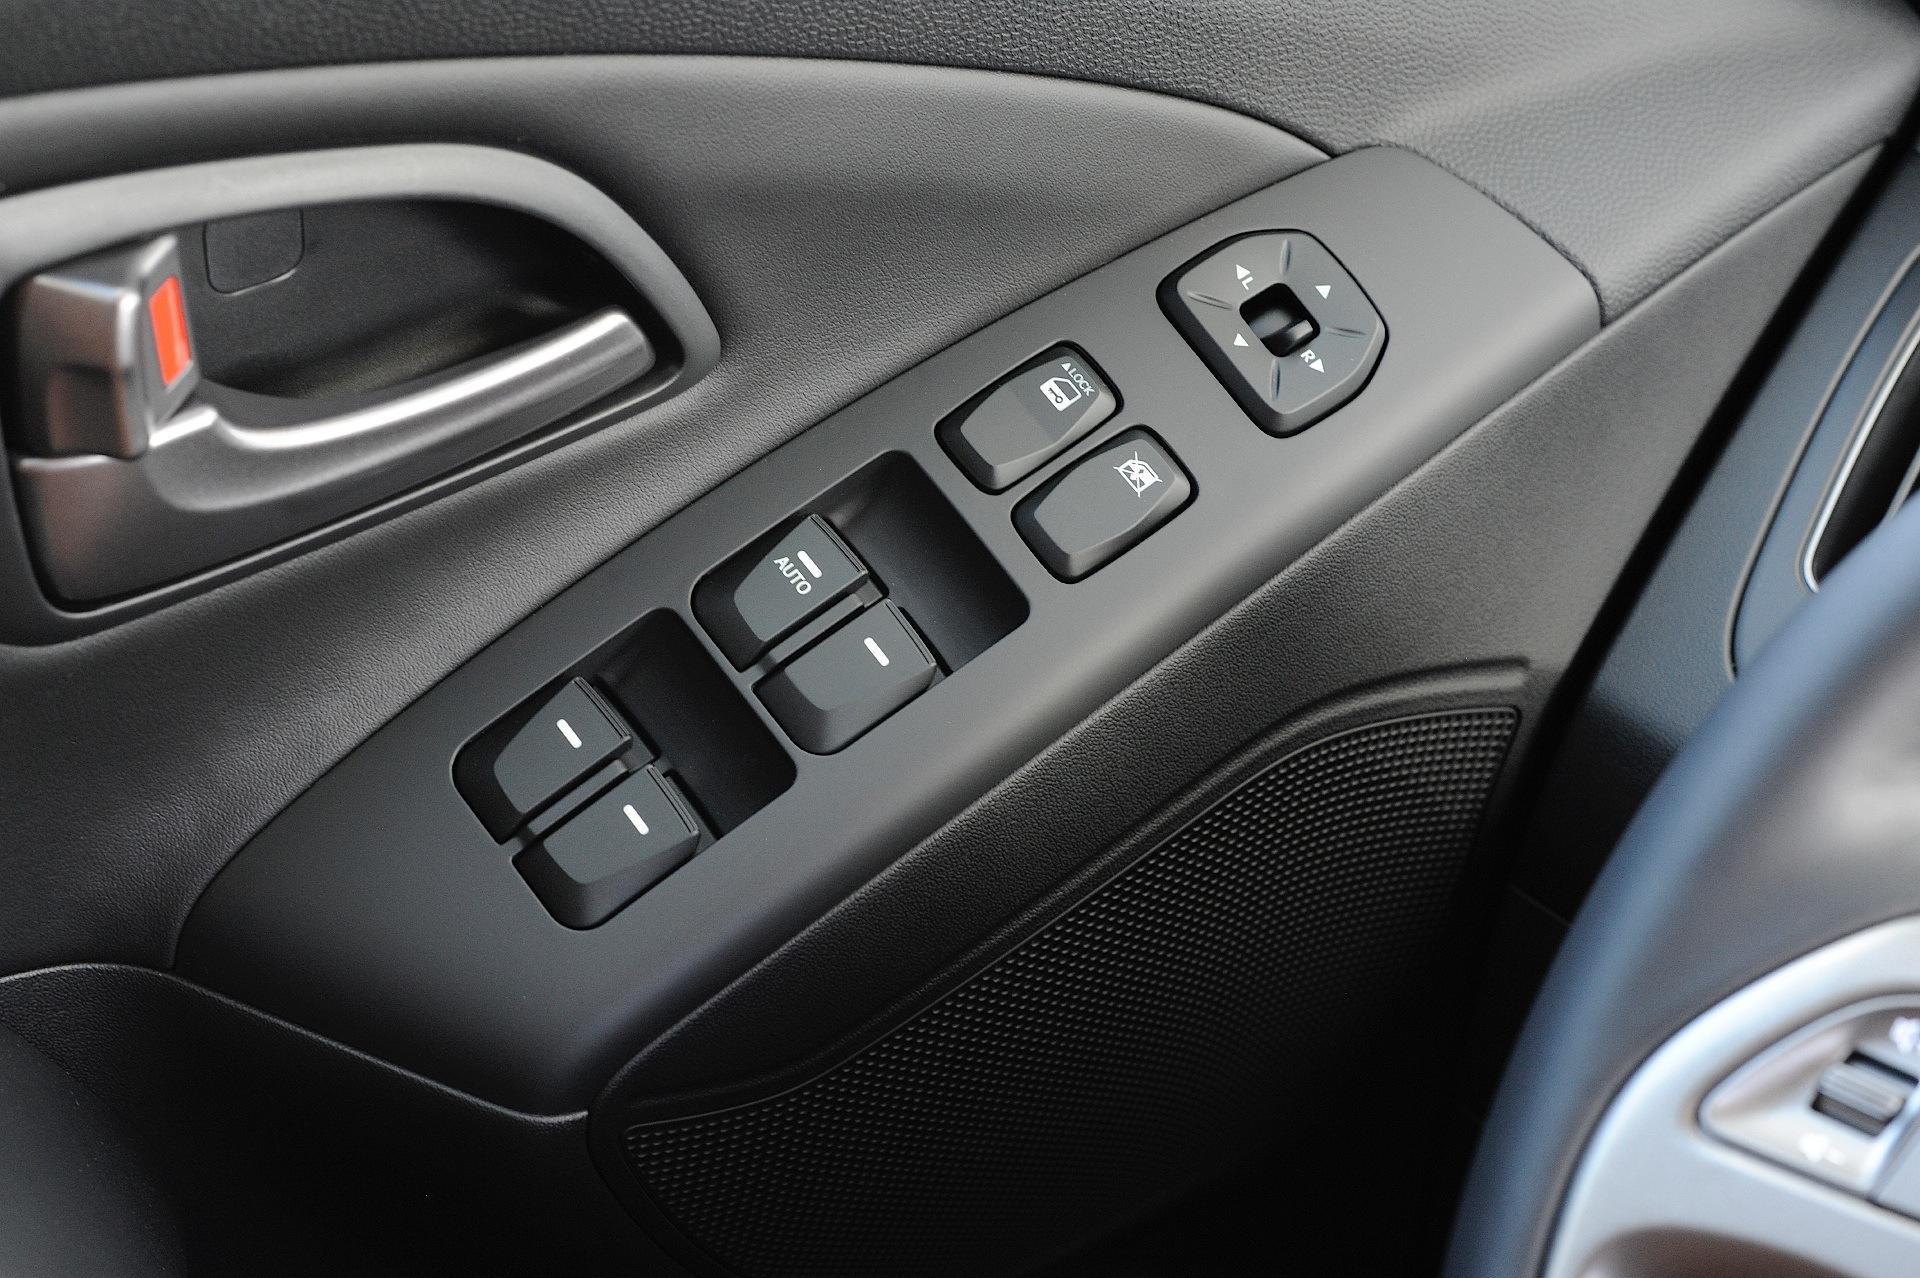 Hyundai Ix Tucson on 2013 Sonata Gdi Engine